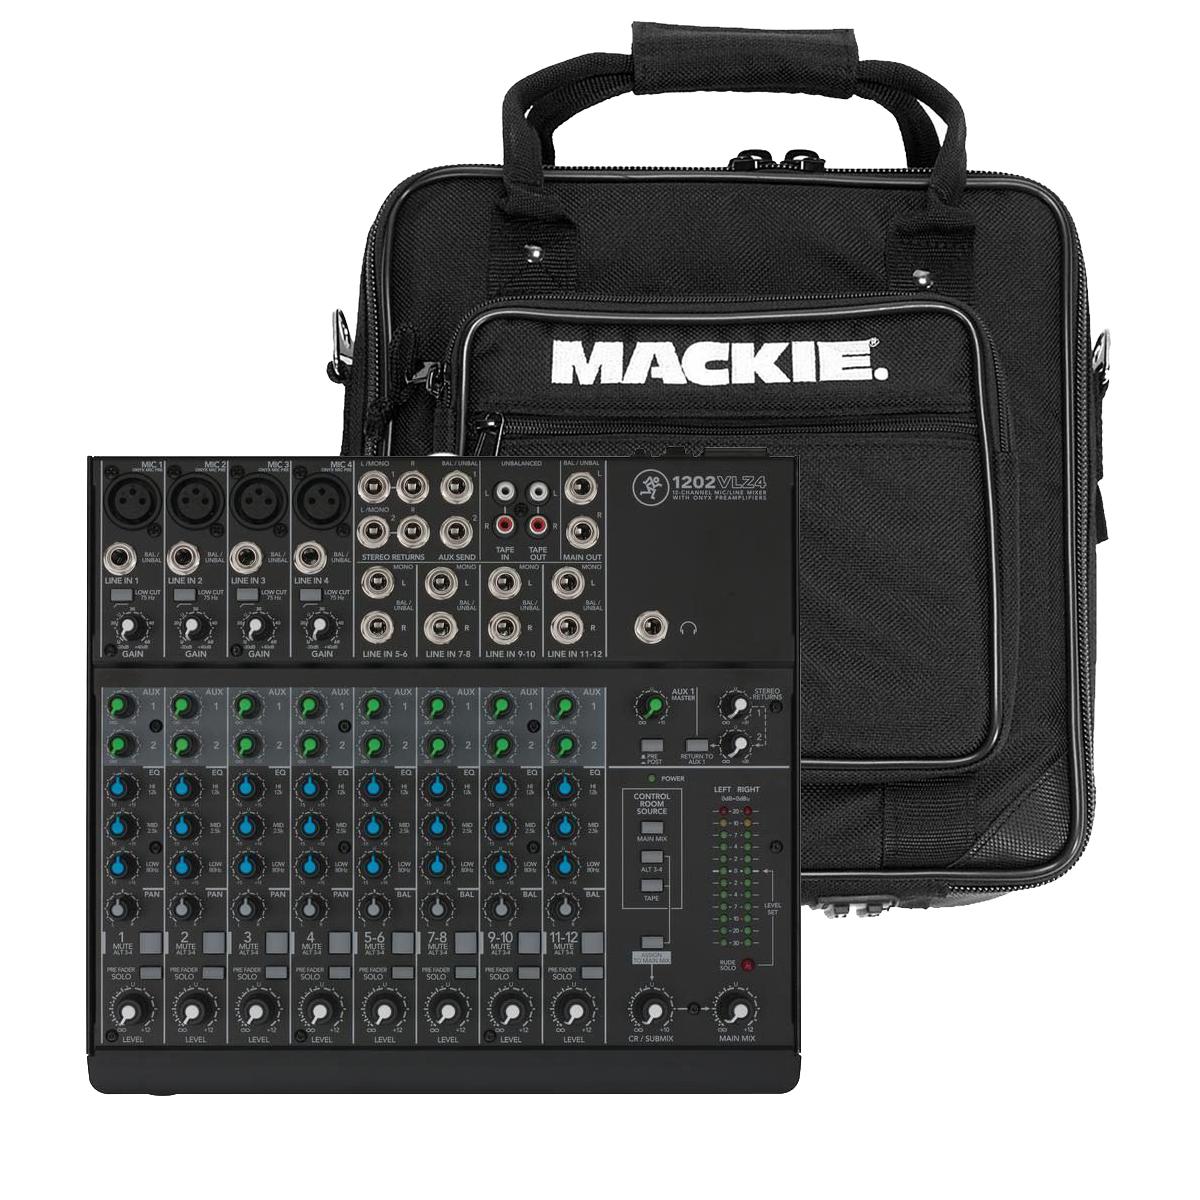 Mackie 1202 VLZ4 mixer + Taske